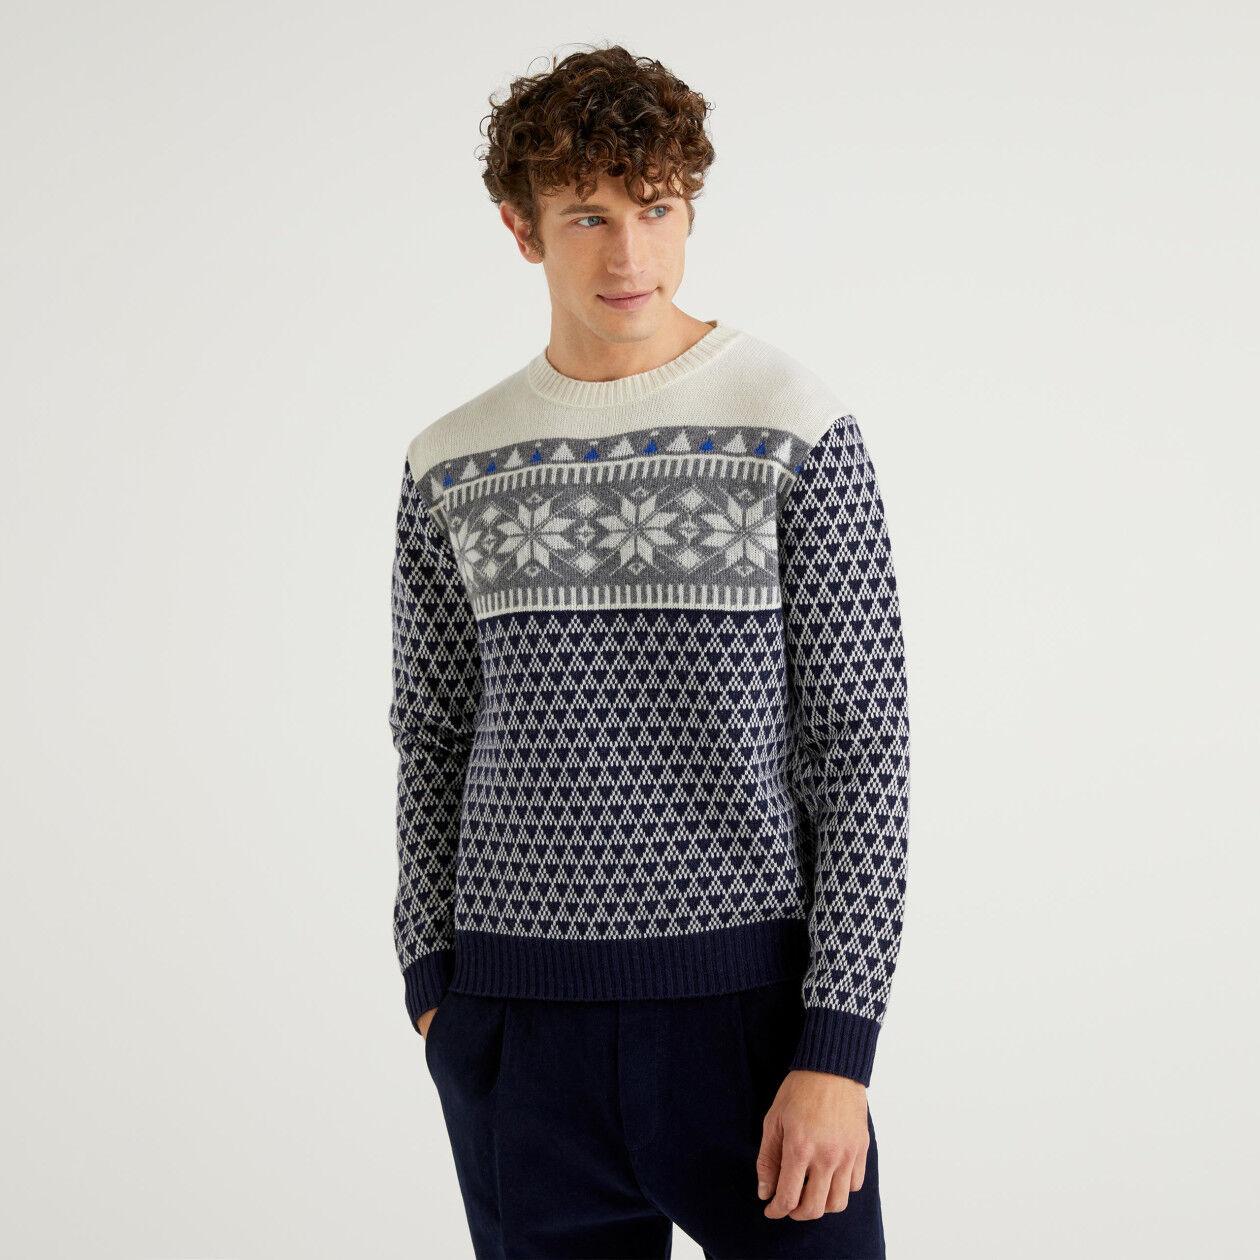 Round neck jacquard sweater